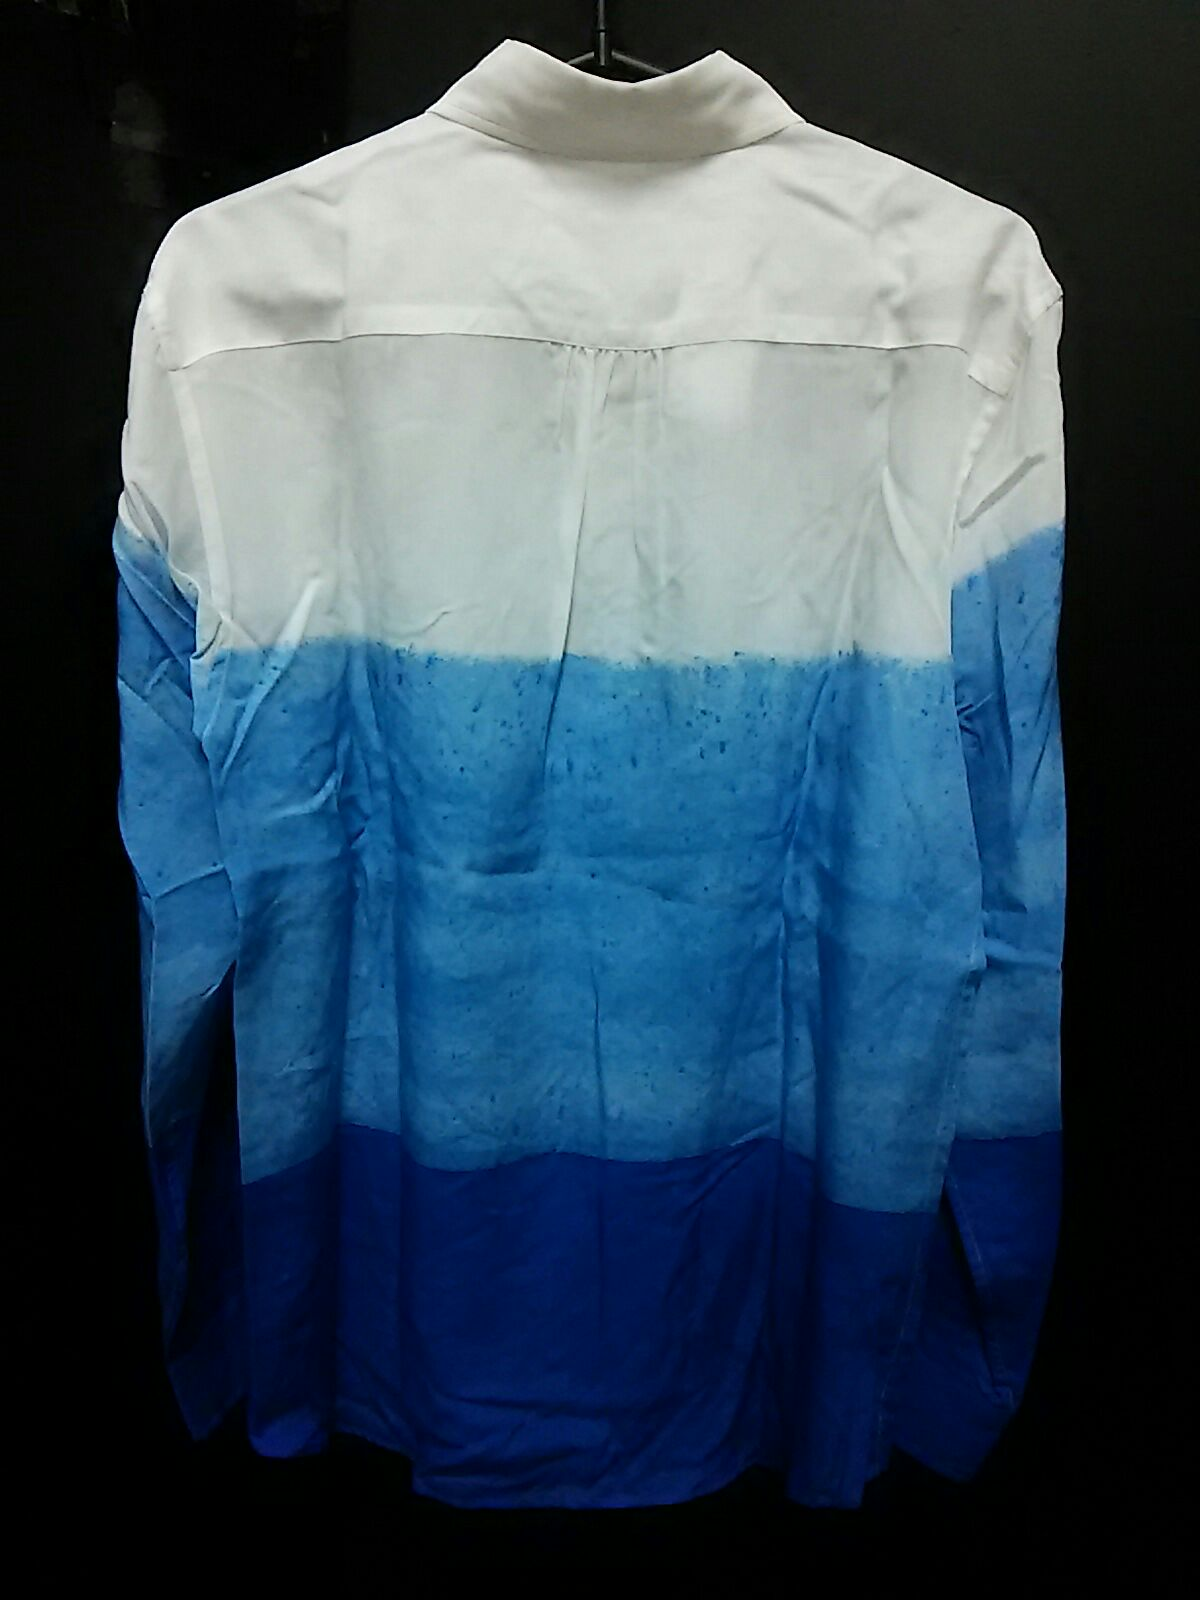 SoeShirts(ソーイシャツ)のシャツ